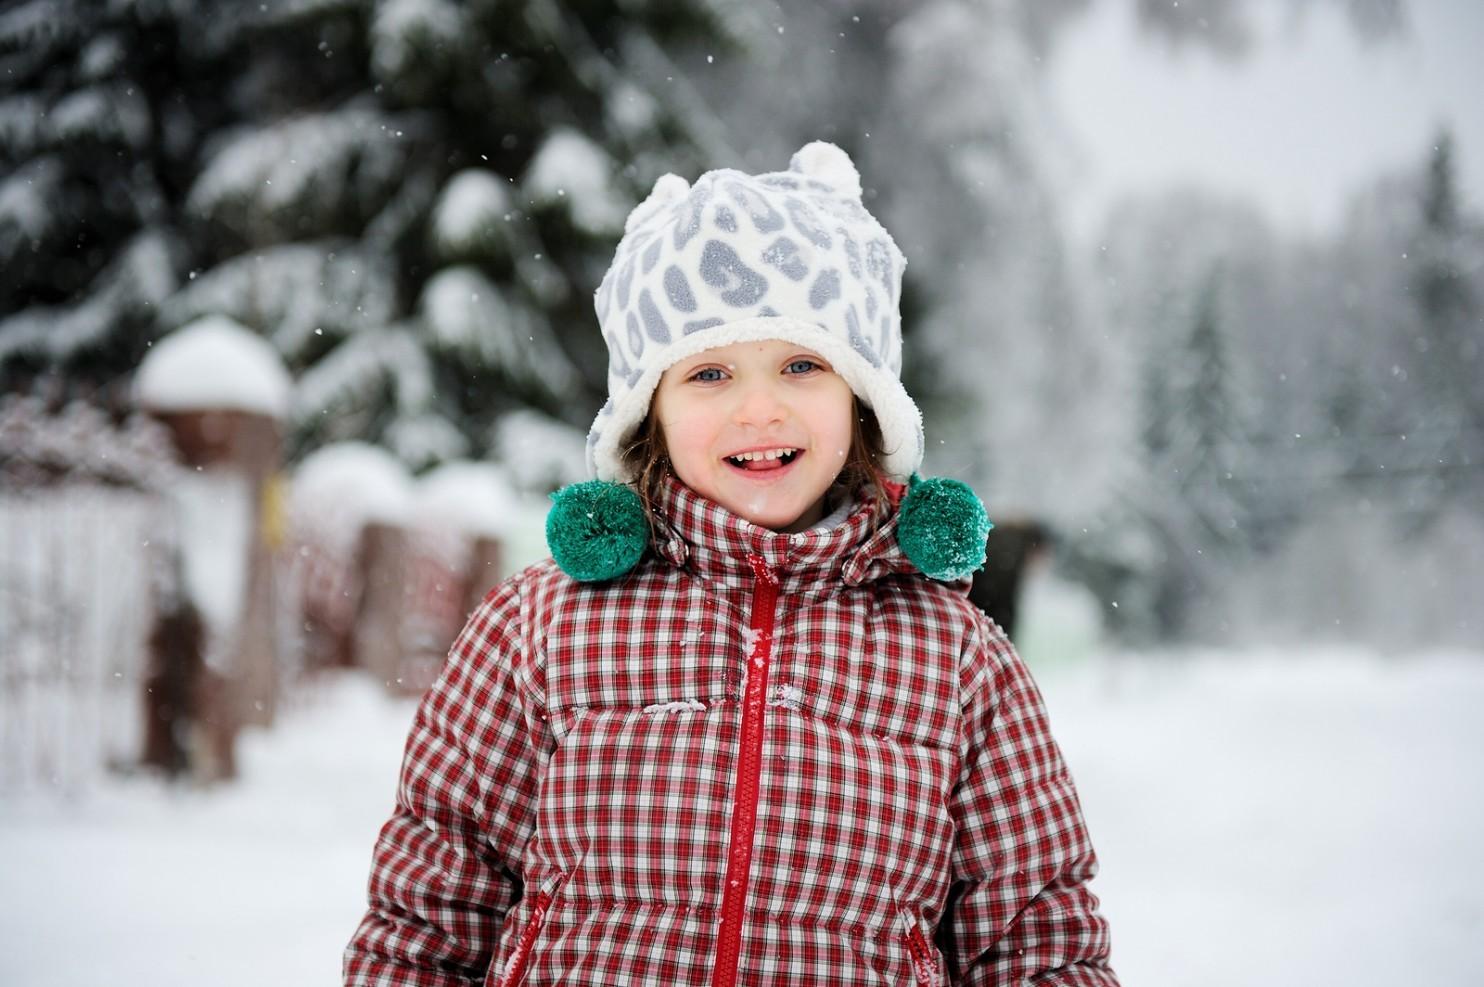 bigstock-winter-portrait-of-adorable-sm-22990748